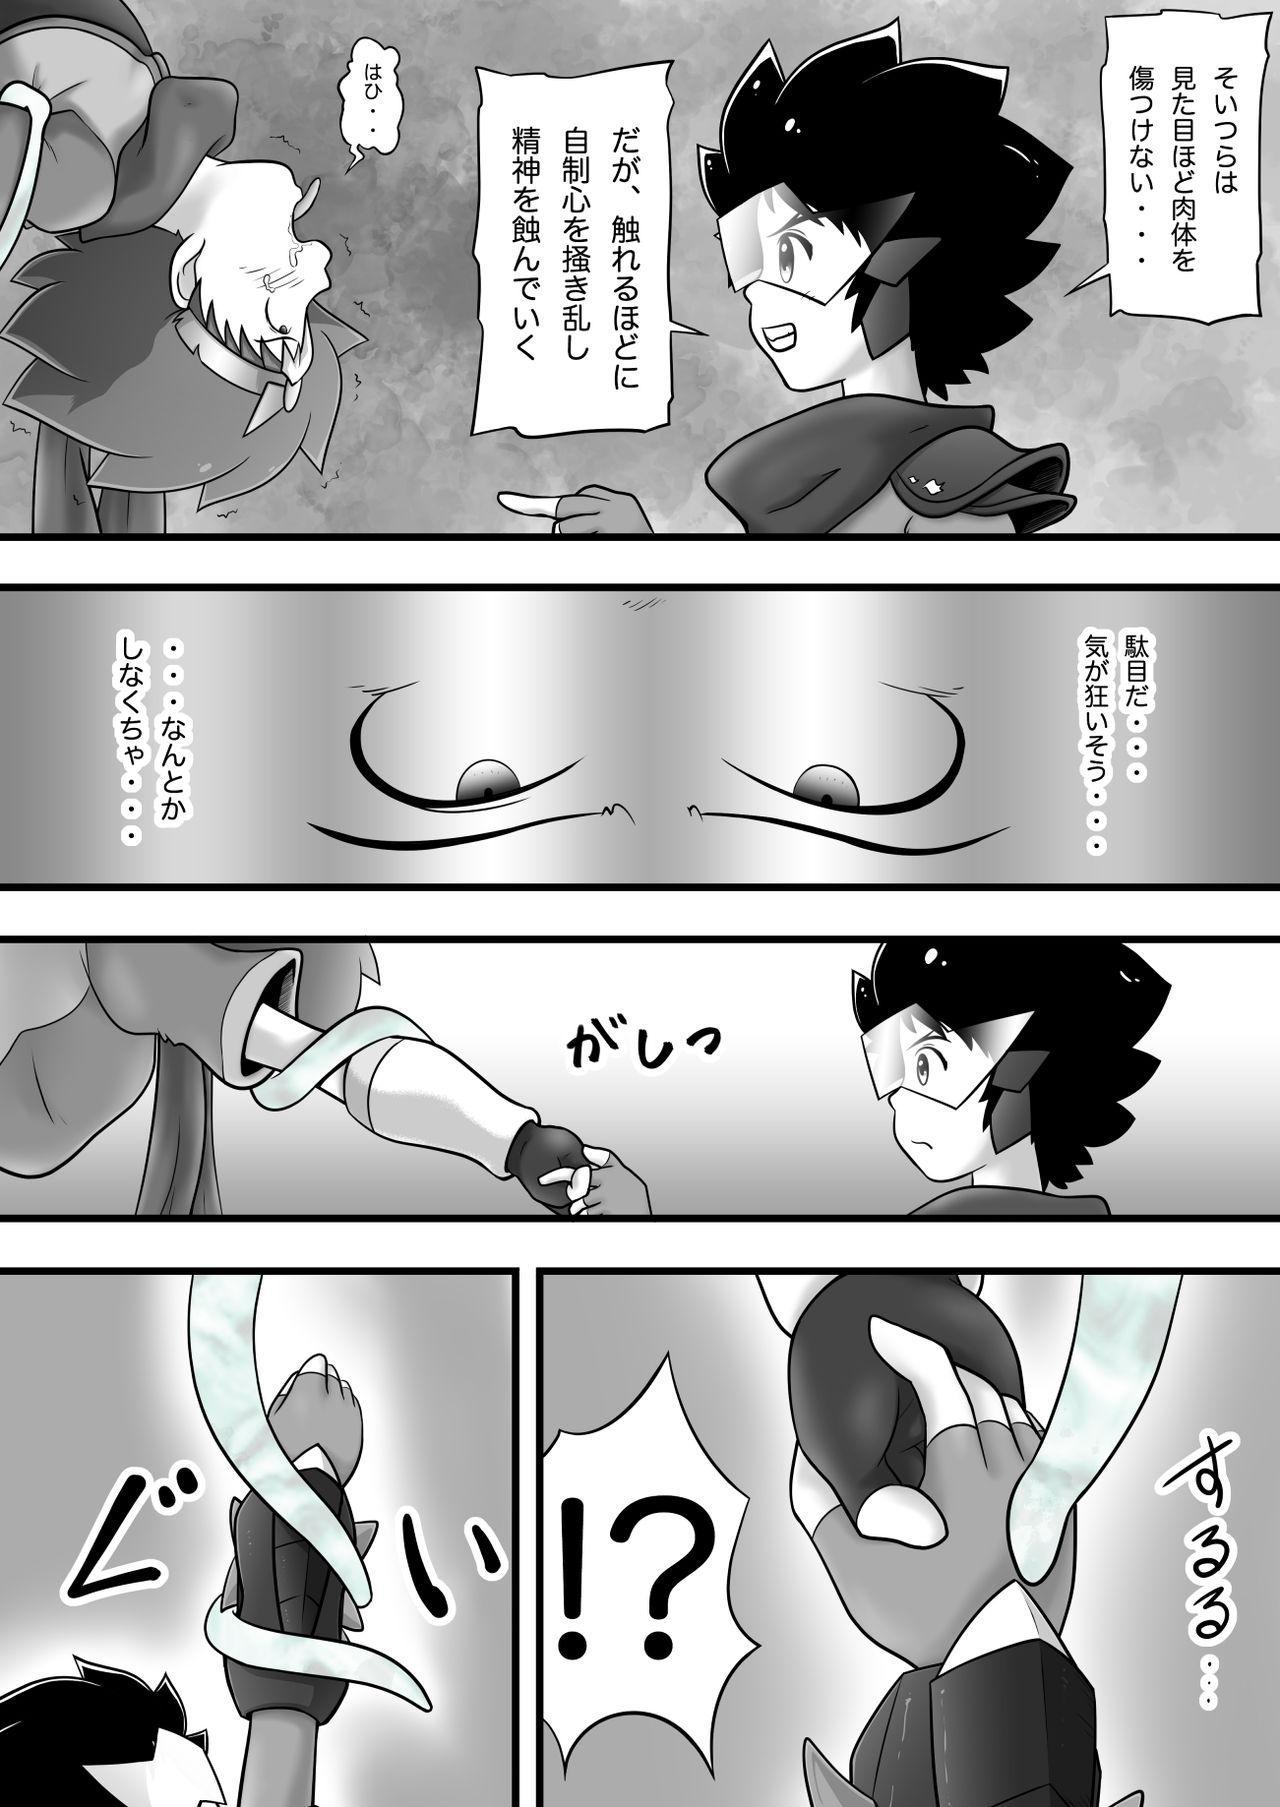 Chrono Kid TSURUGI VS Enboy 21